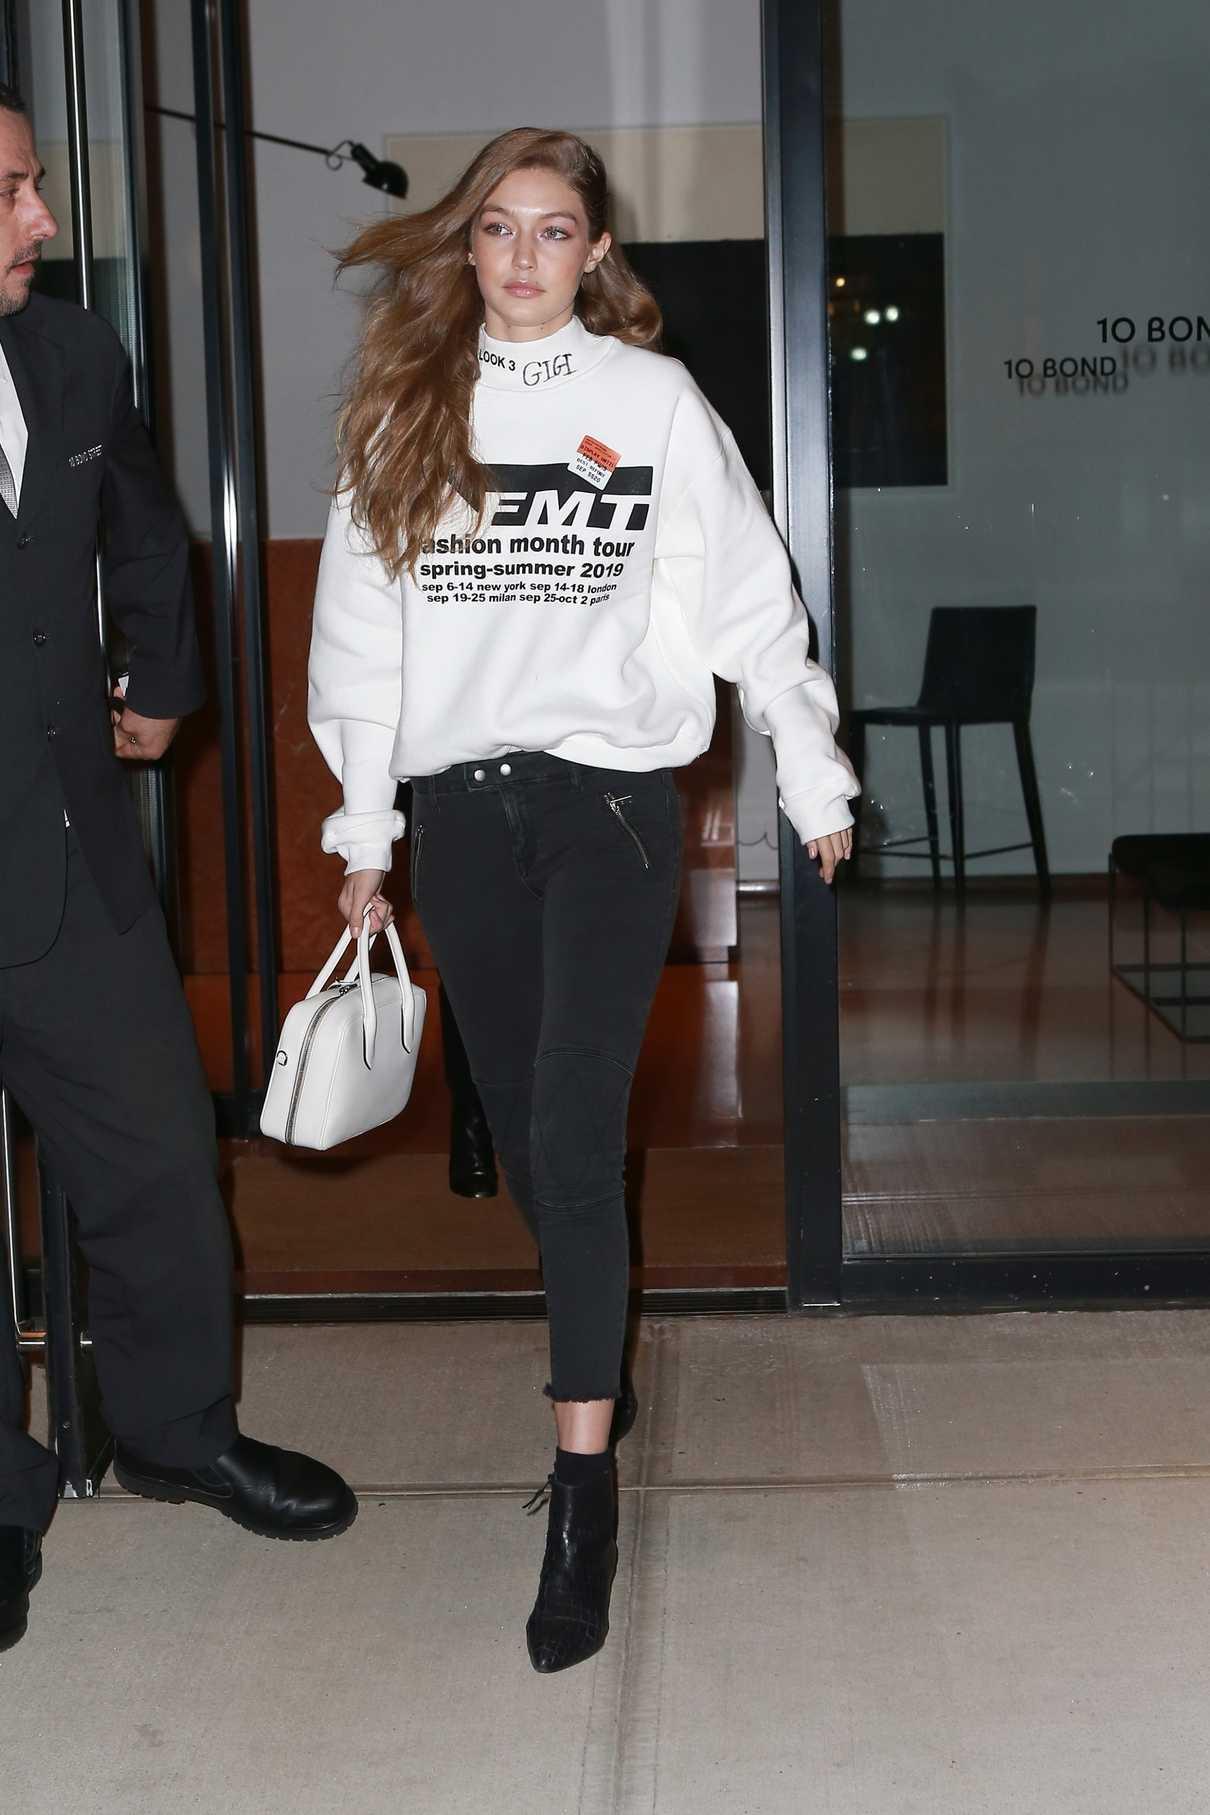 Gigi Hadid in a White Sweatshirt